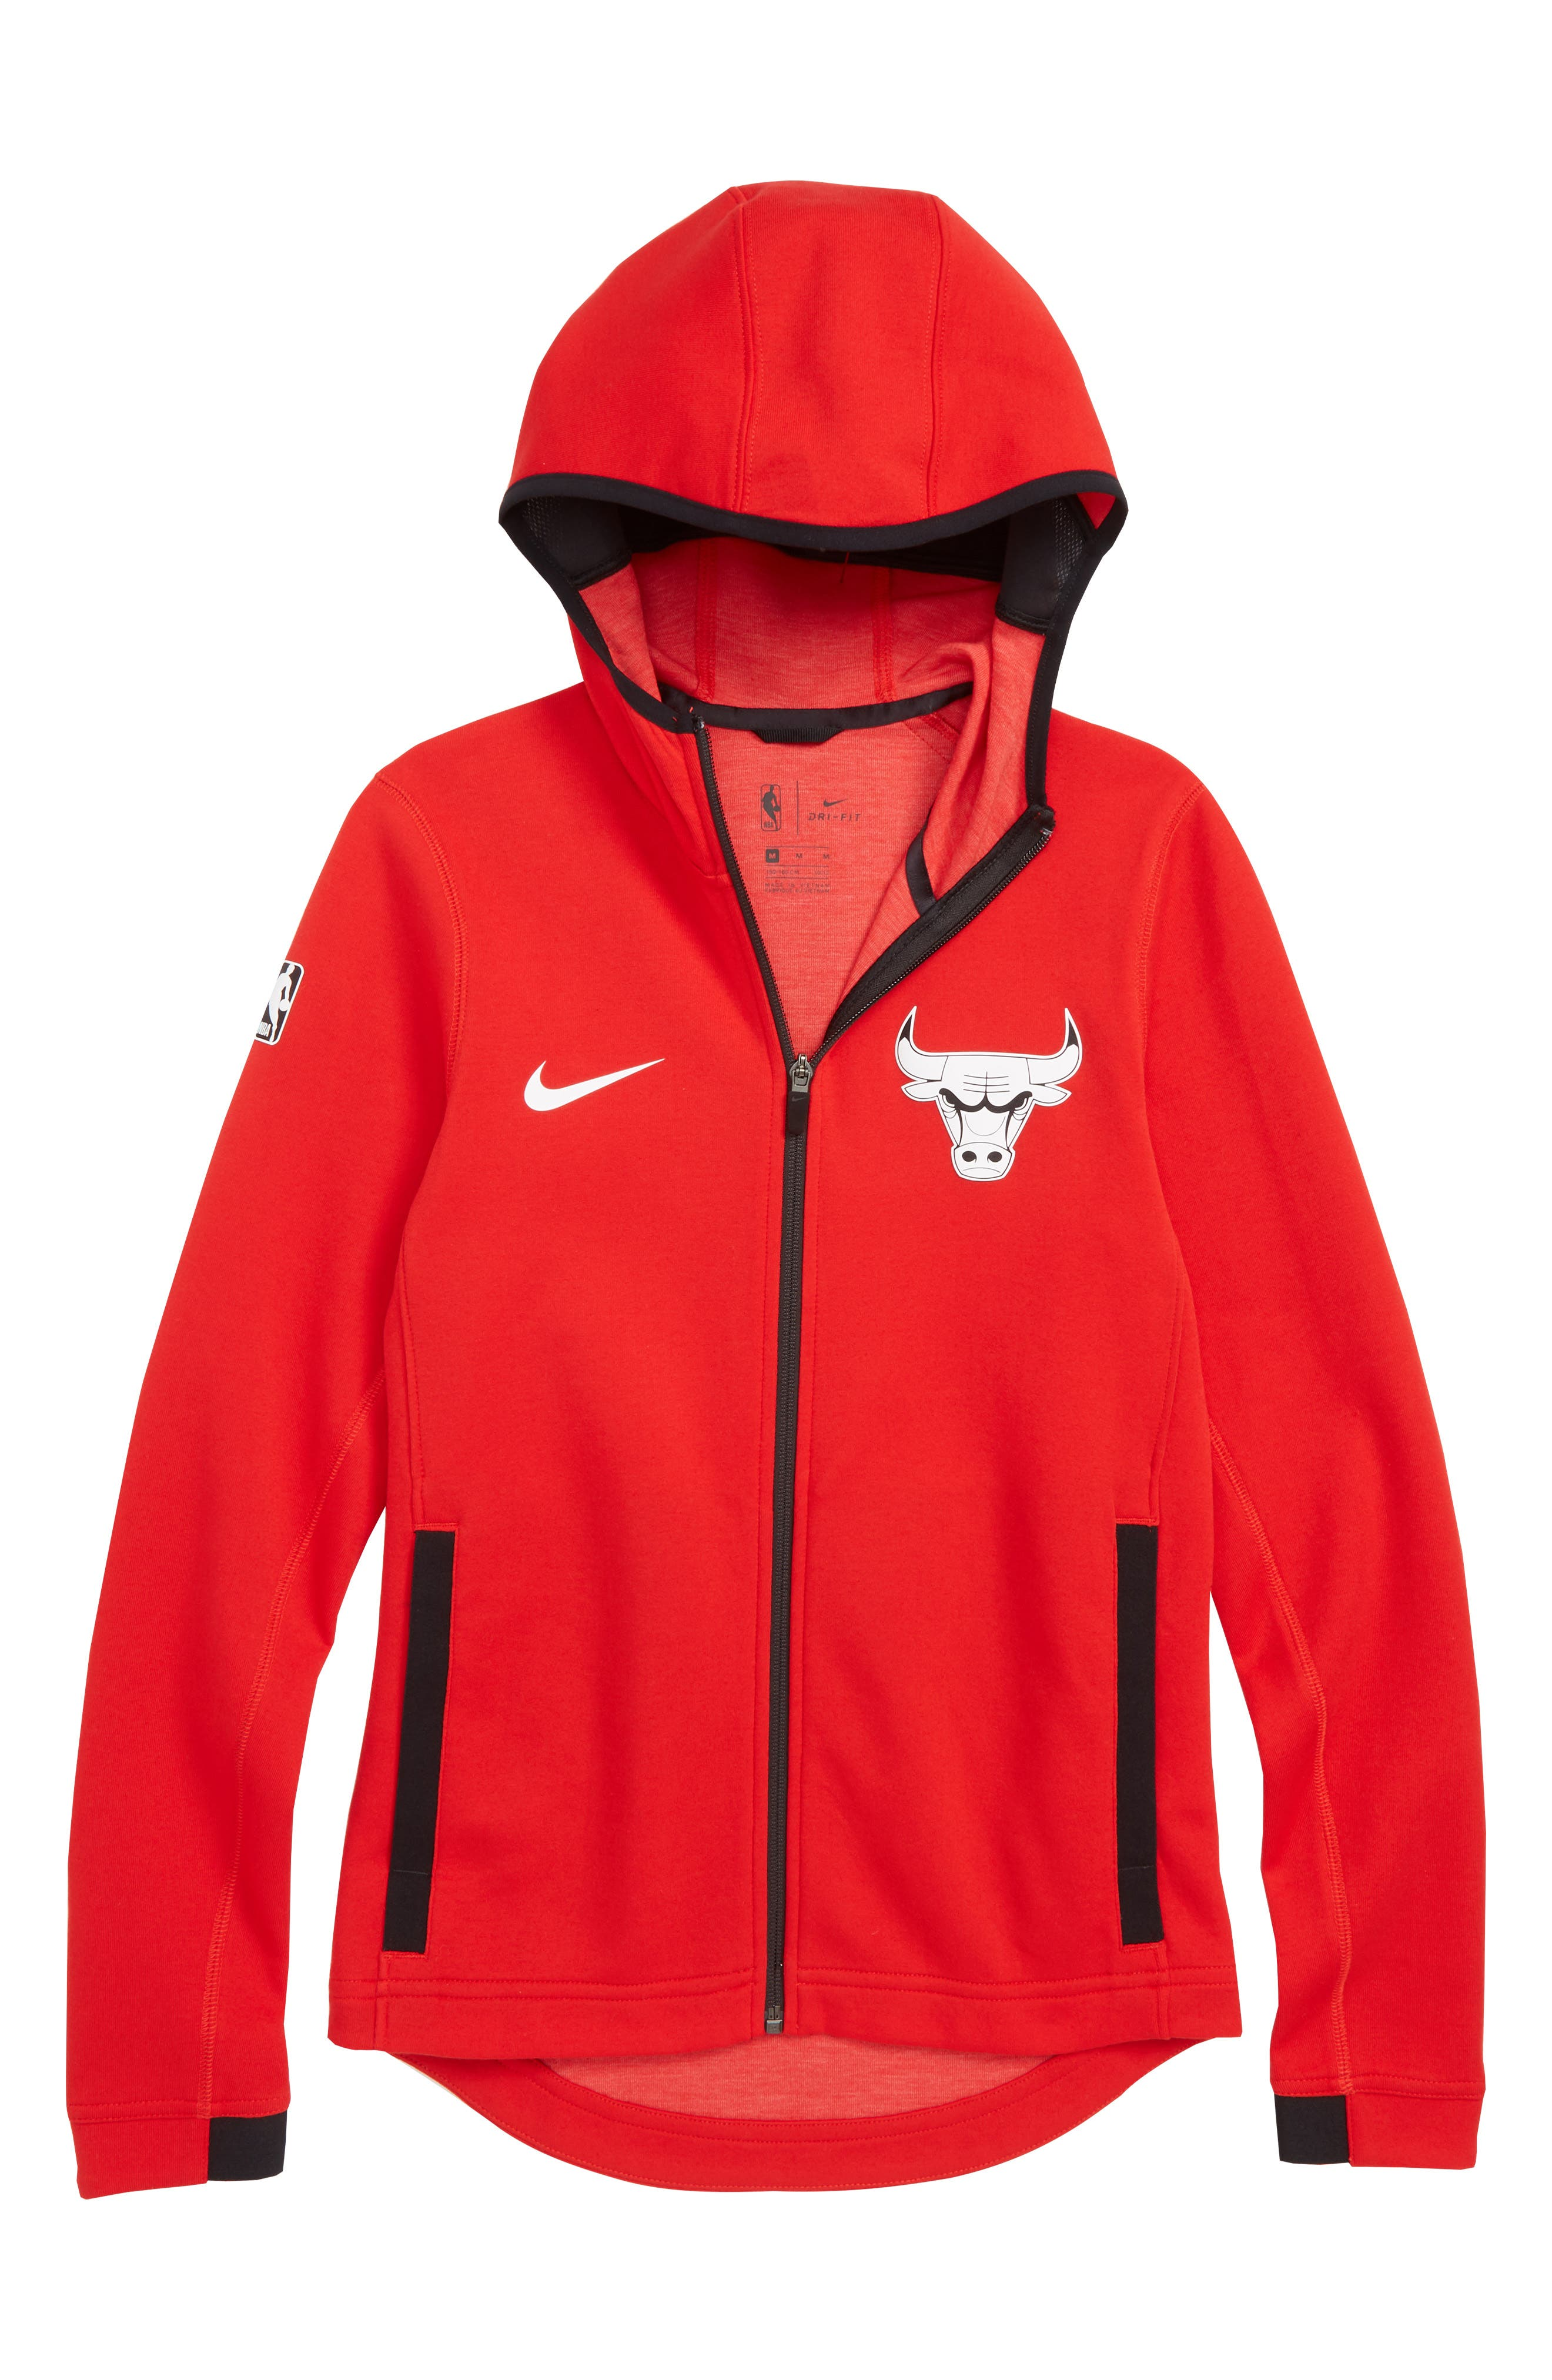 Chicago Bulls Showtime Dri-FIT Zip Hoodie, Main, color, UNIVERSITY RED